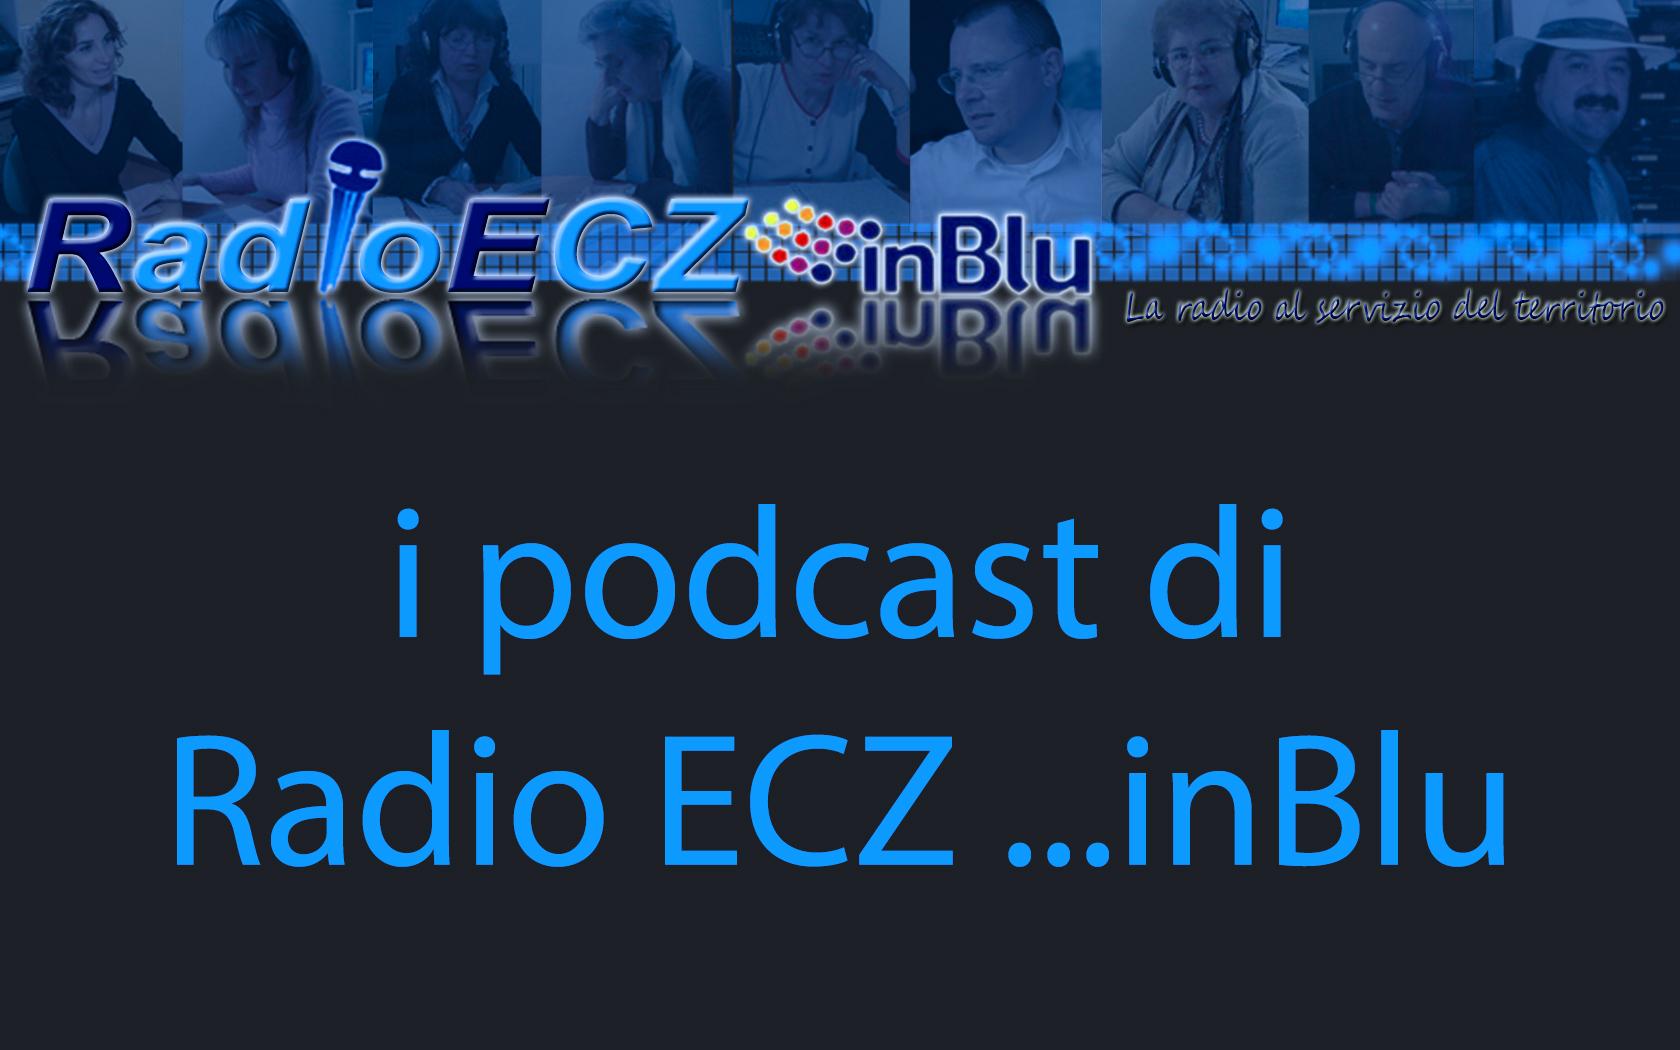 Radio ECZ ...inBlu